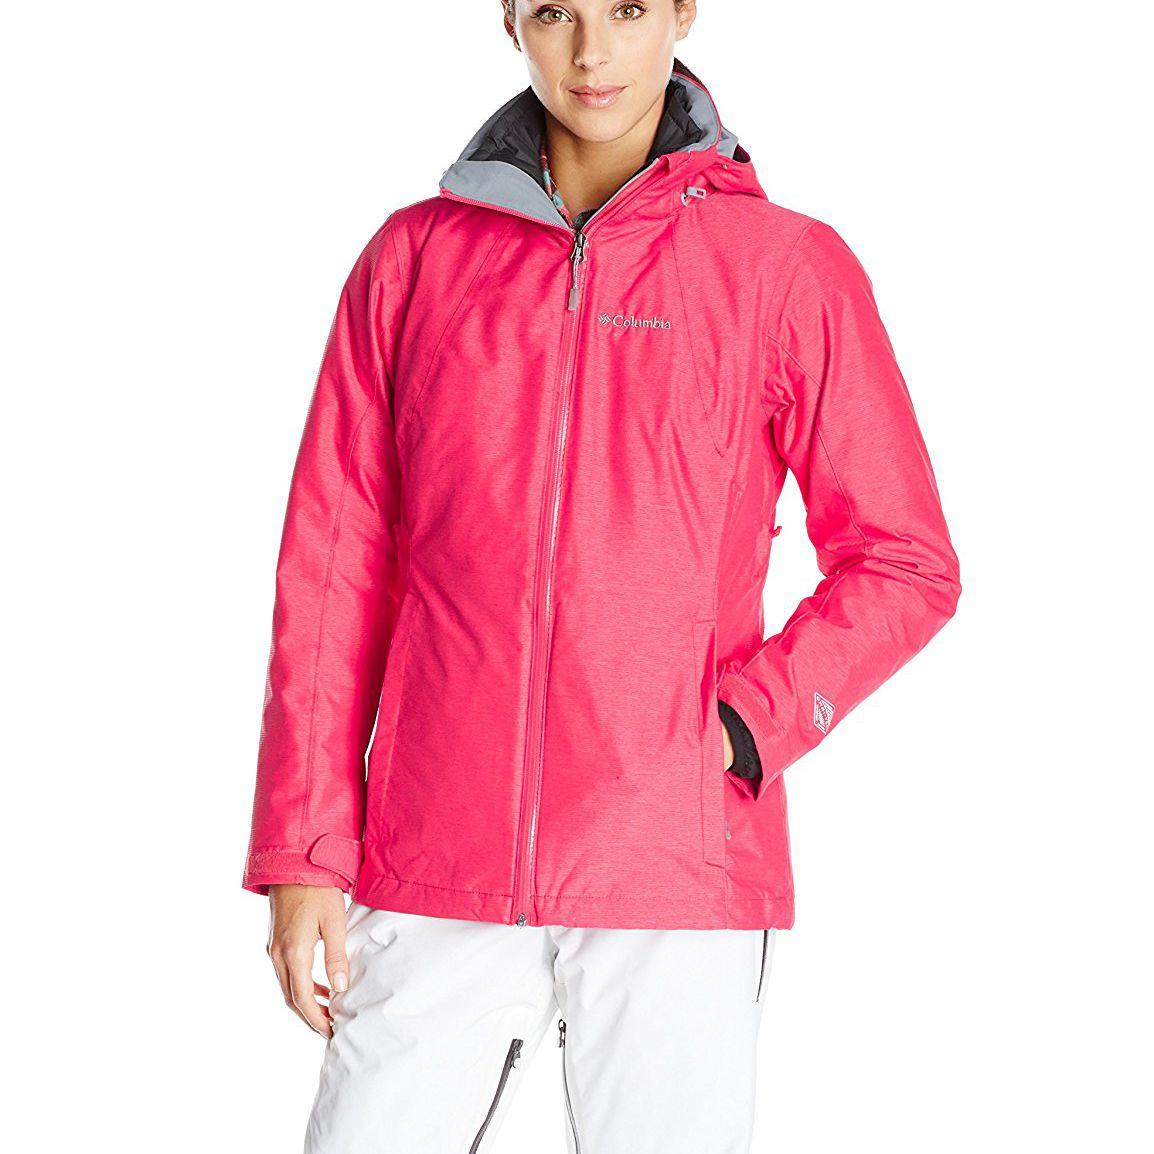 woman in ski jacket